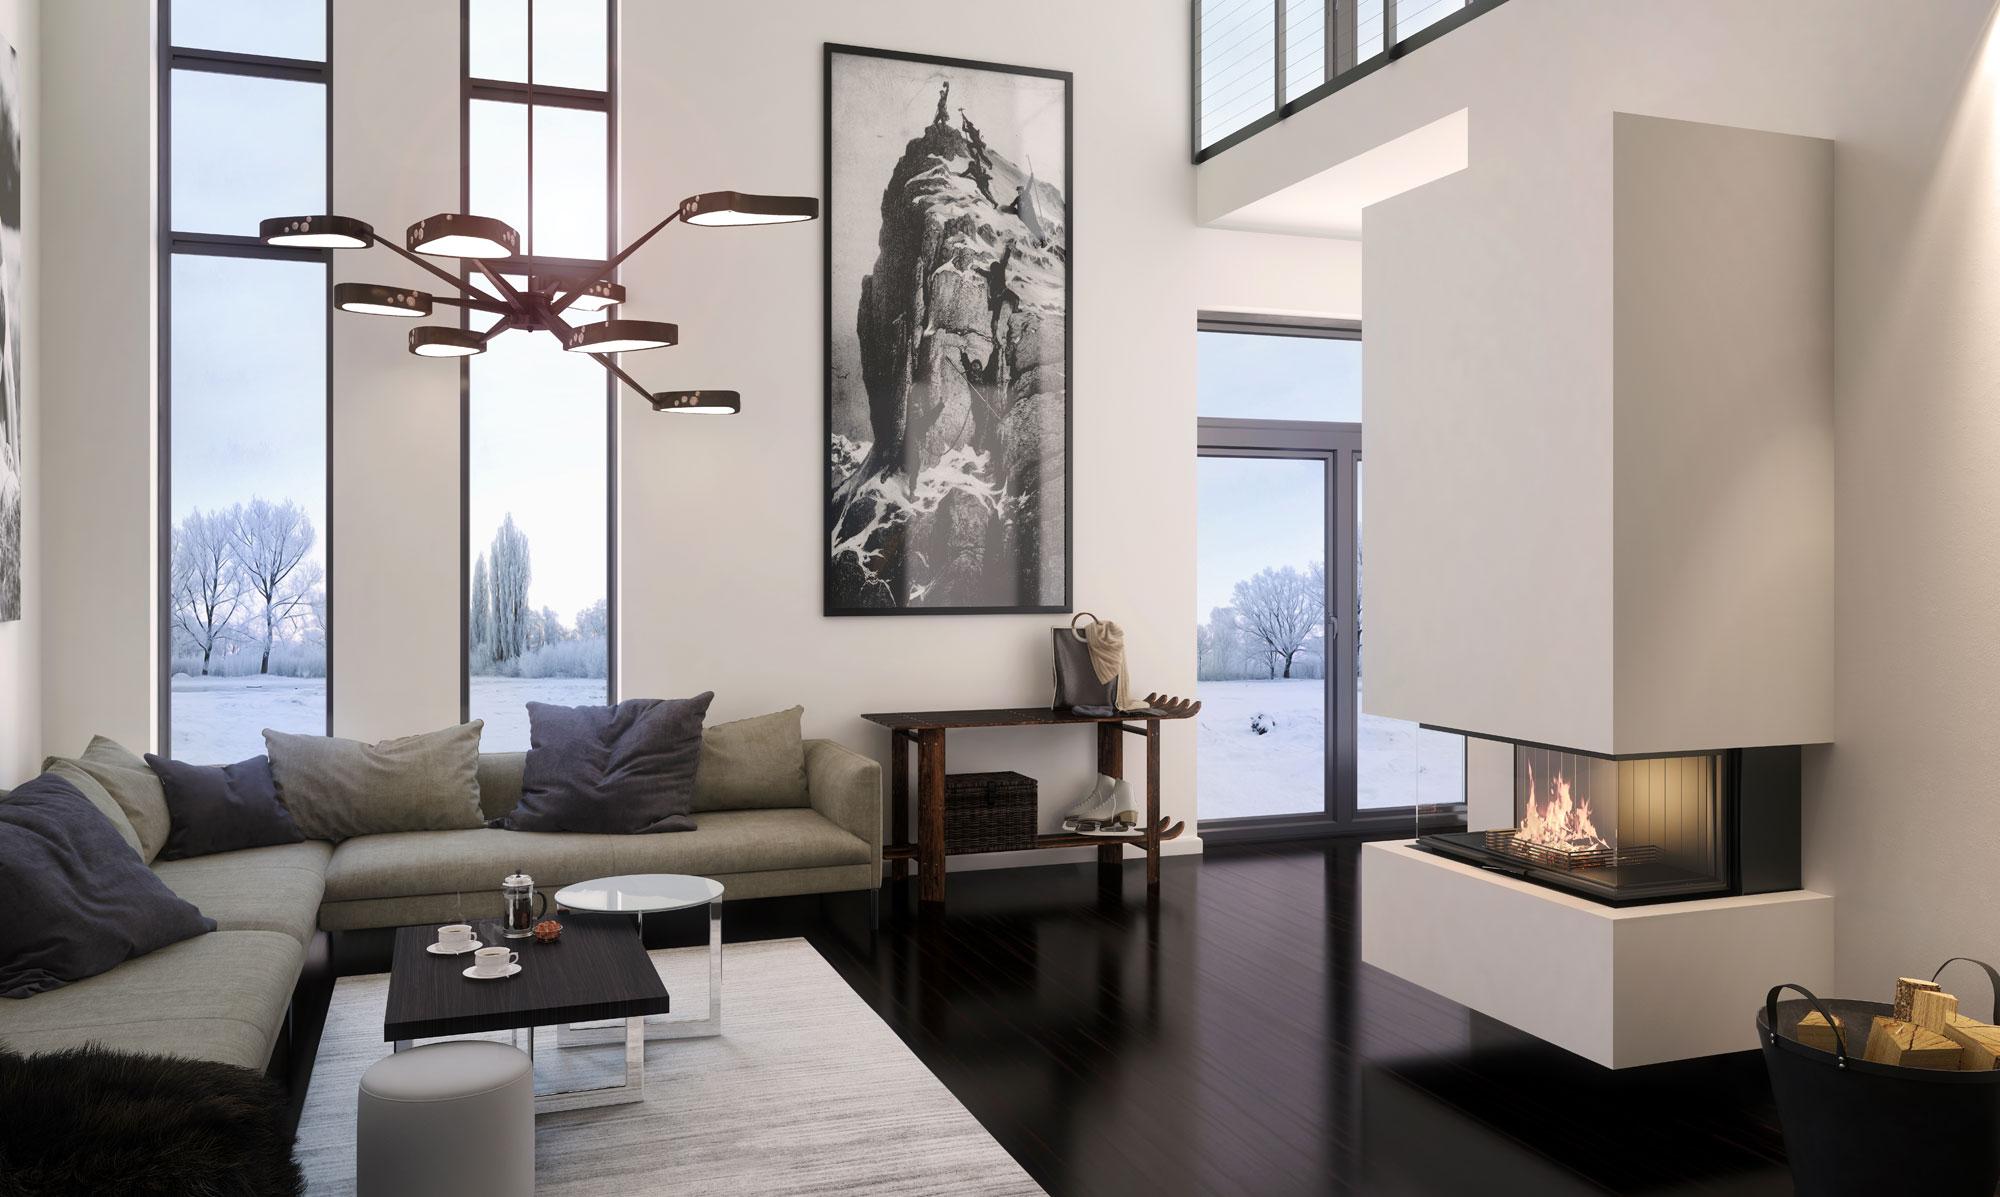 kubbe kamine und fen. Black Bedroom Furniture Sets. Home Design Ideas